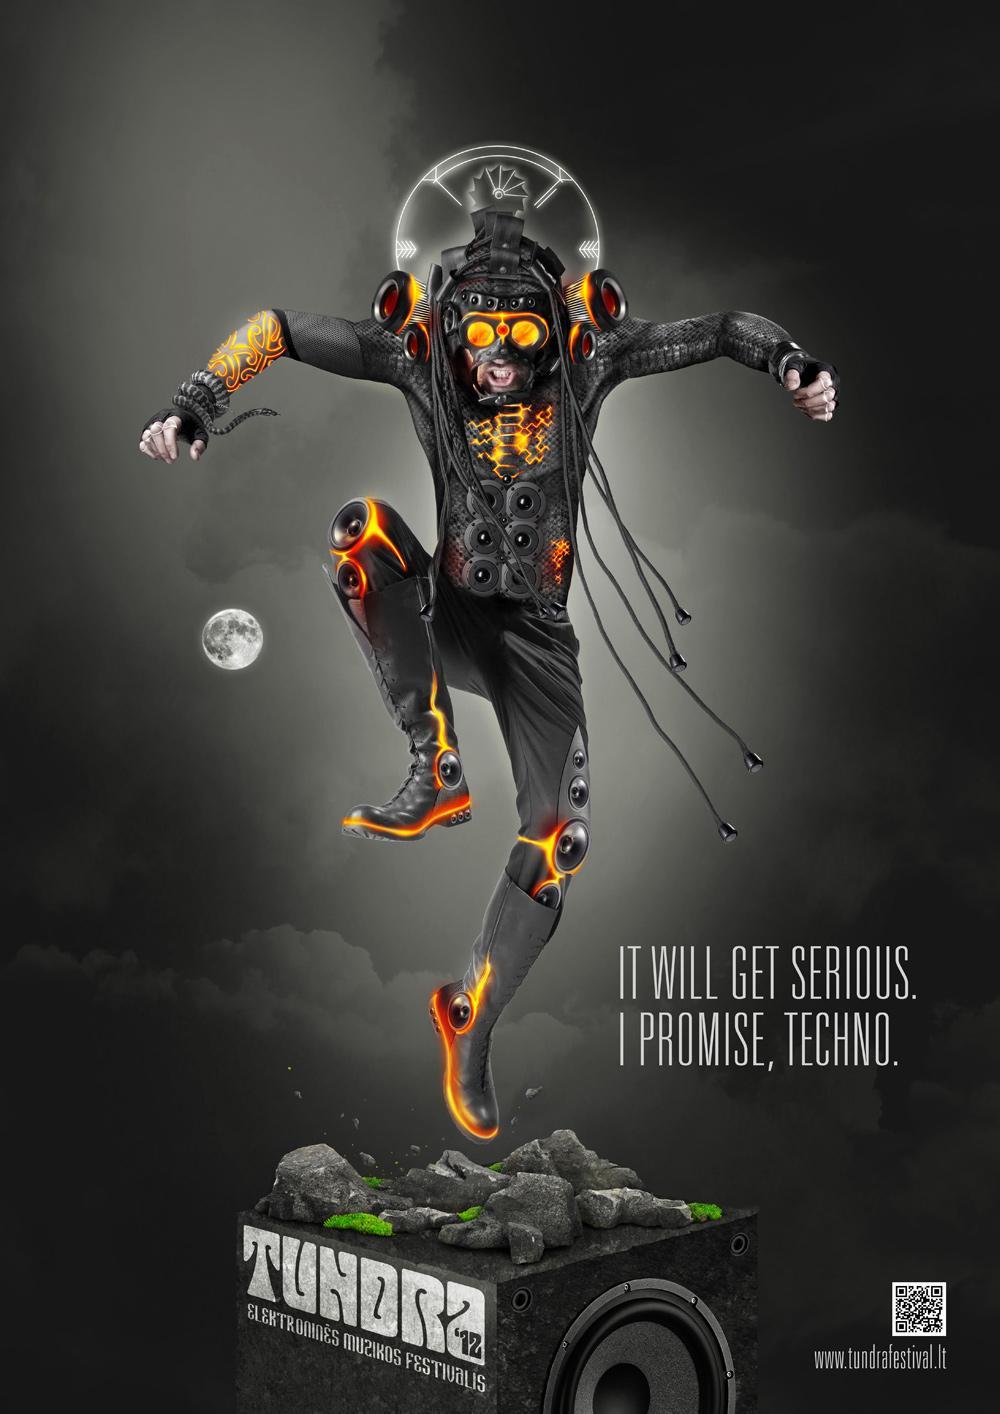 Tundra Festival Outdoor Ad -  Gods of Music, Techno